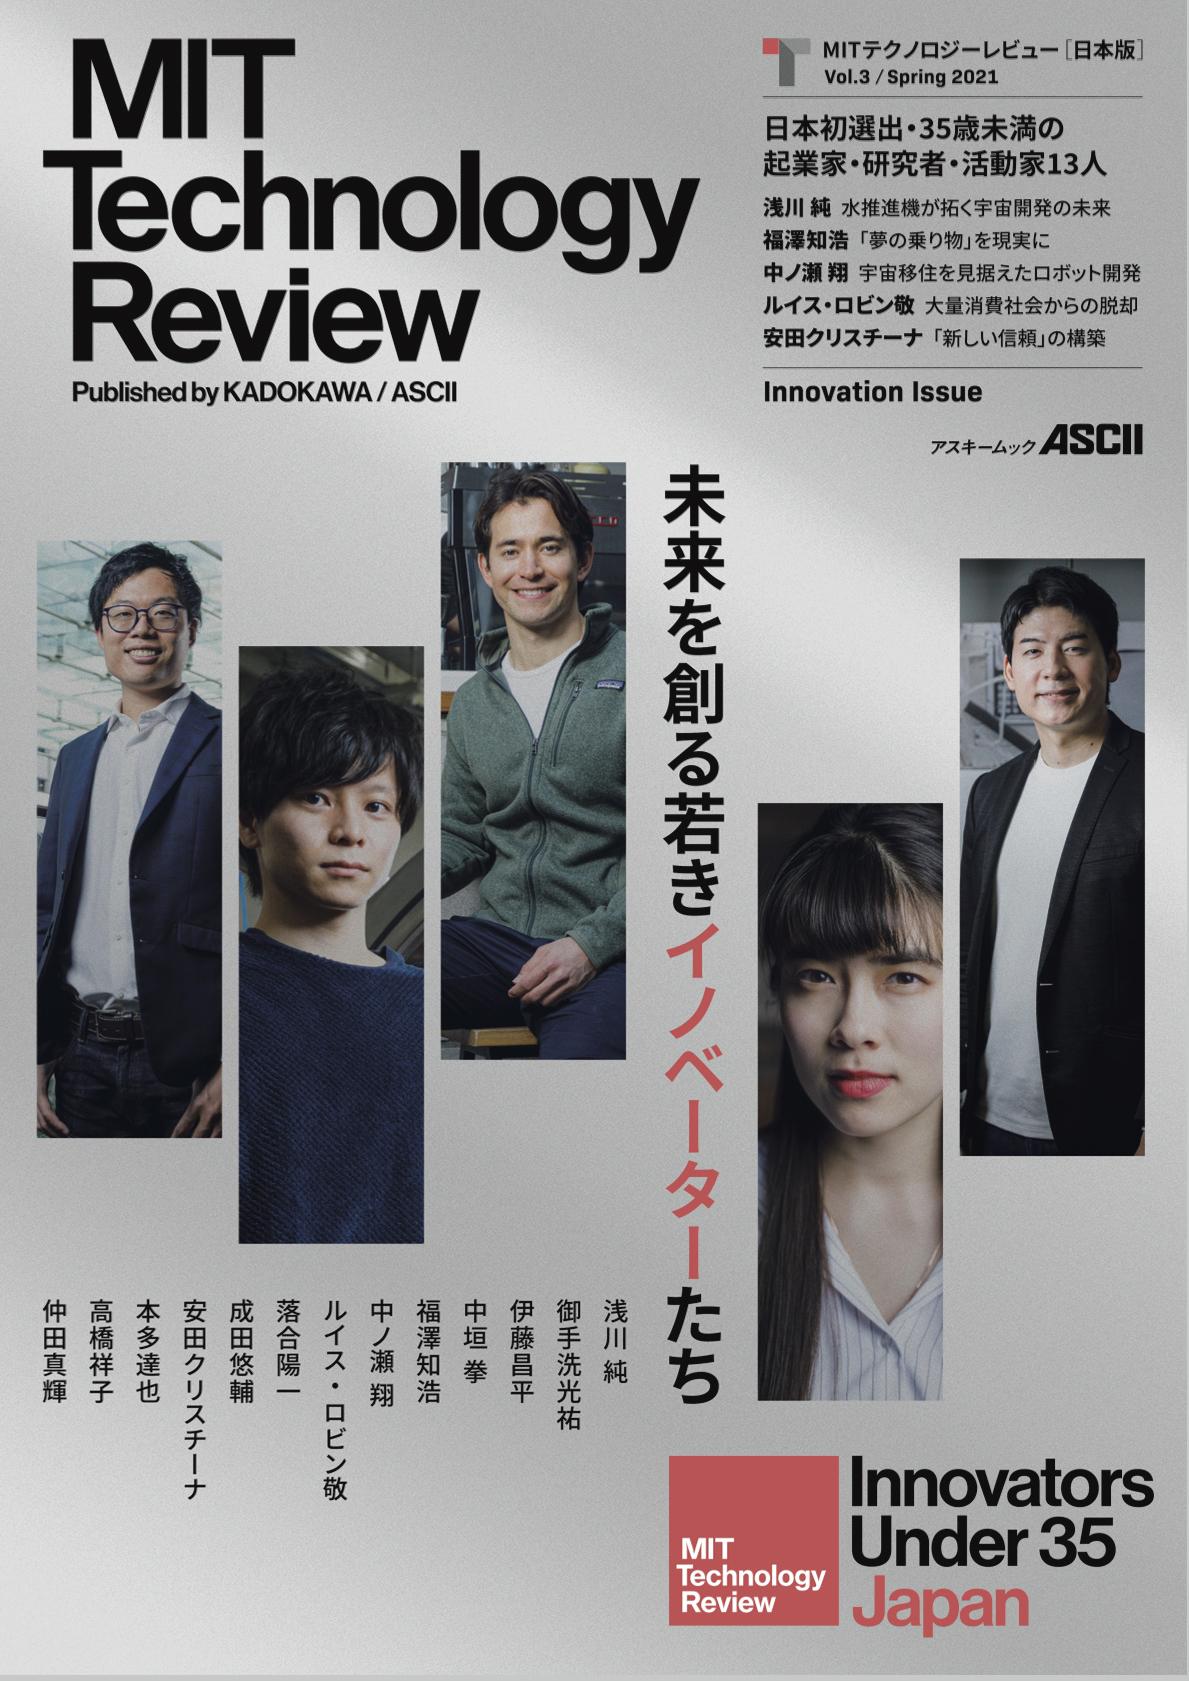 MITテクノロジーレビュー[日本版] Vol.3/Spring 2021